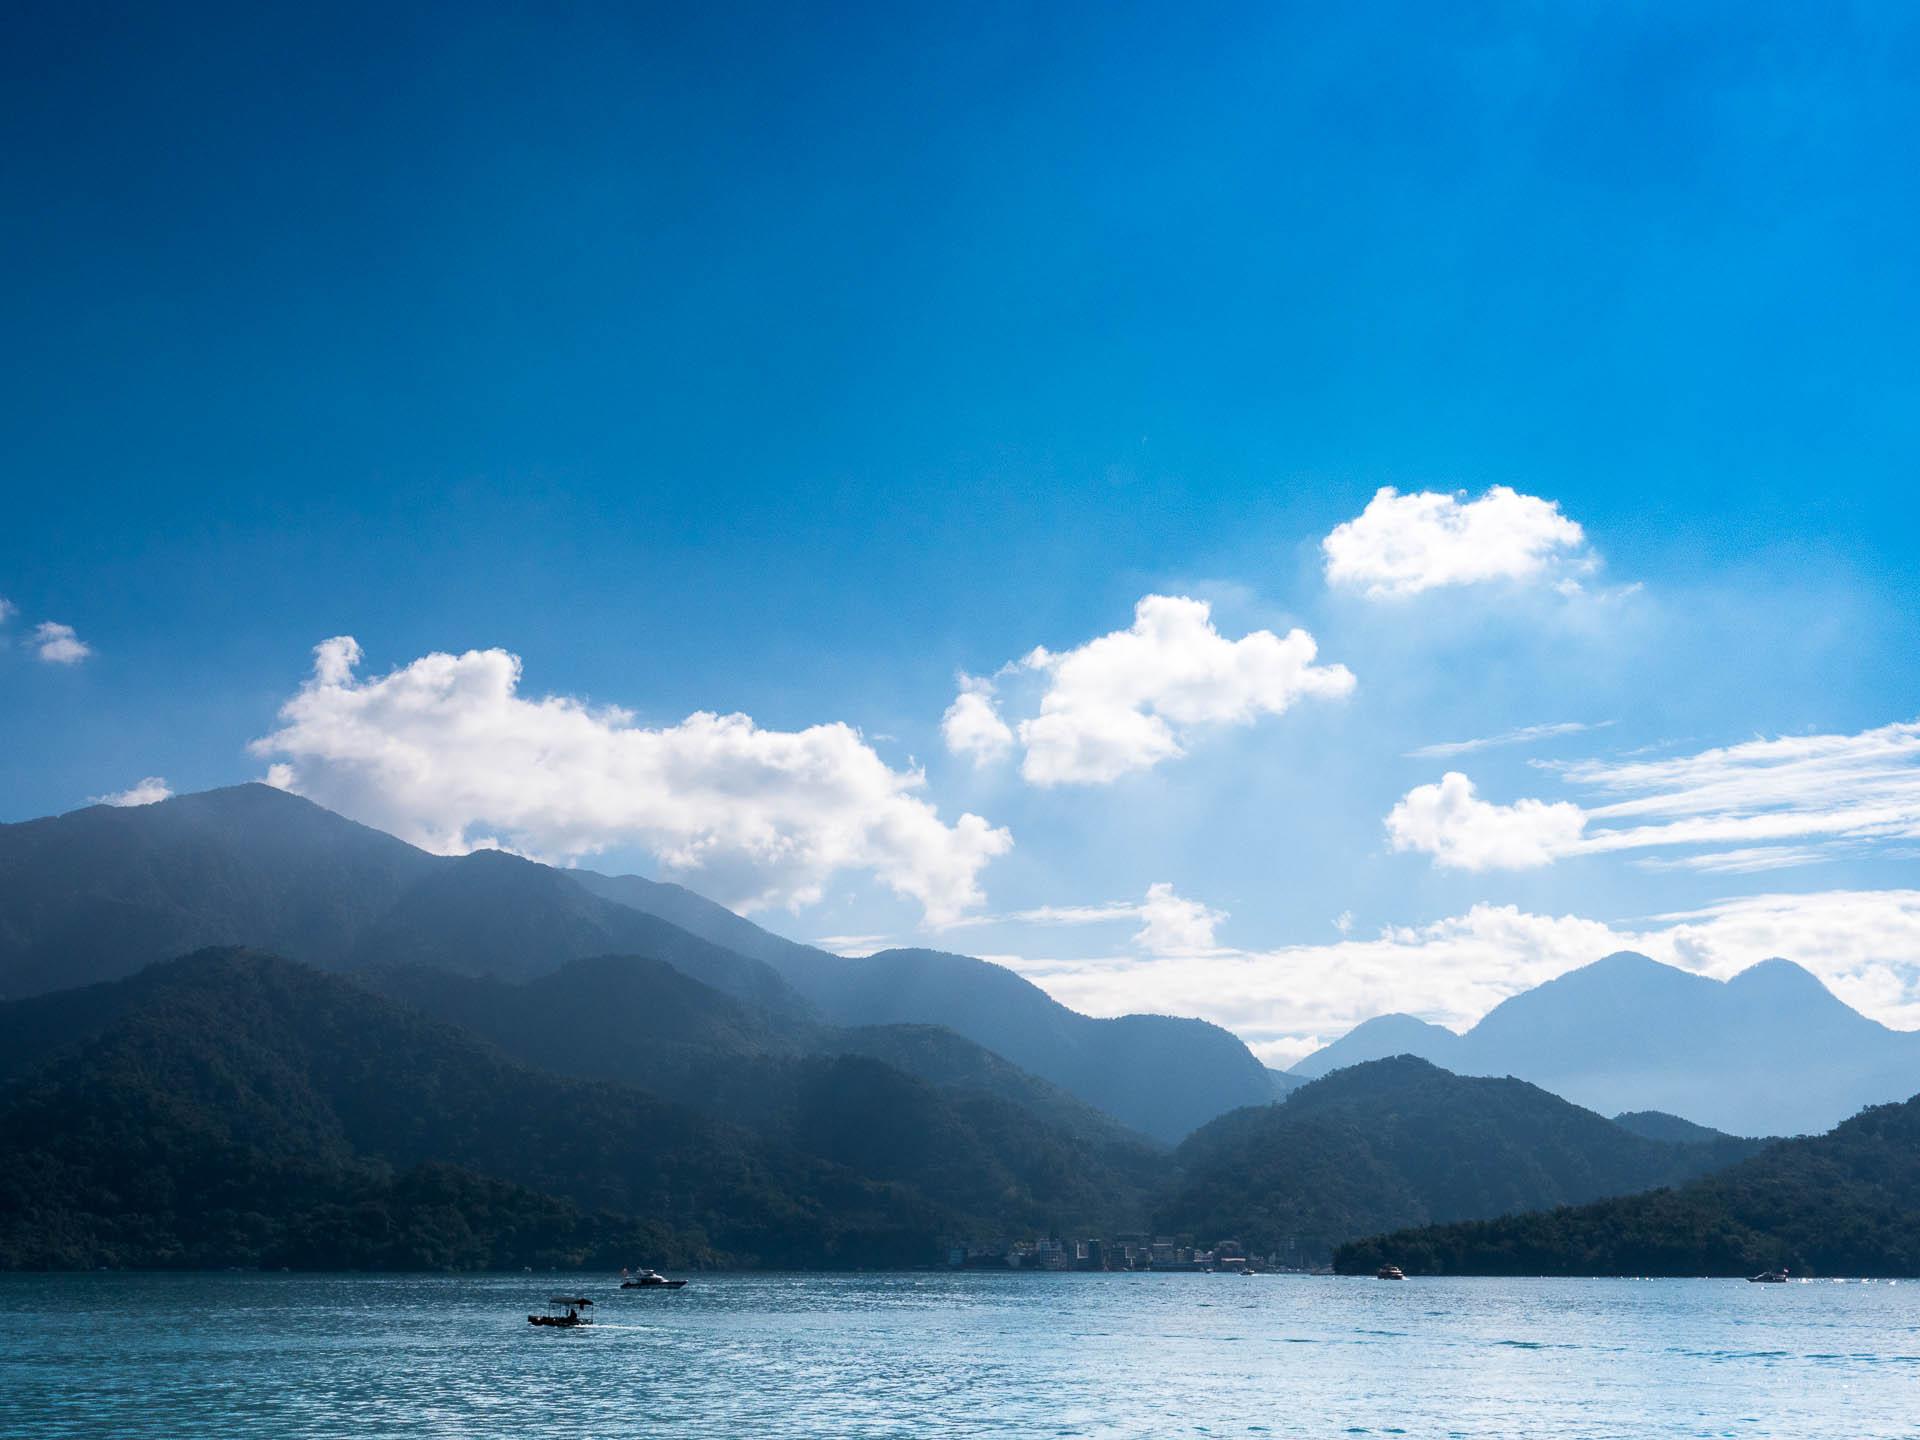 Sun moon lake montagnes - Les globe blogueurs - blog voyage nature